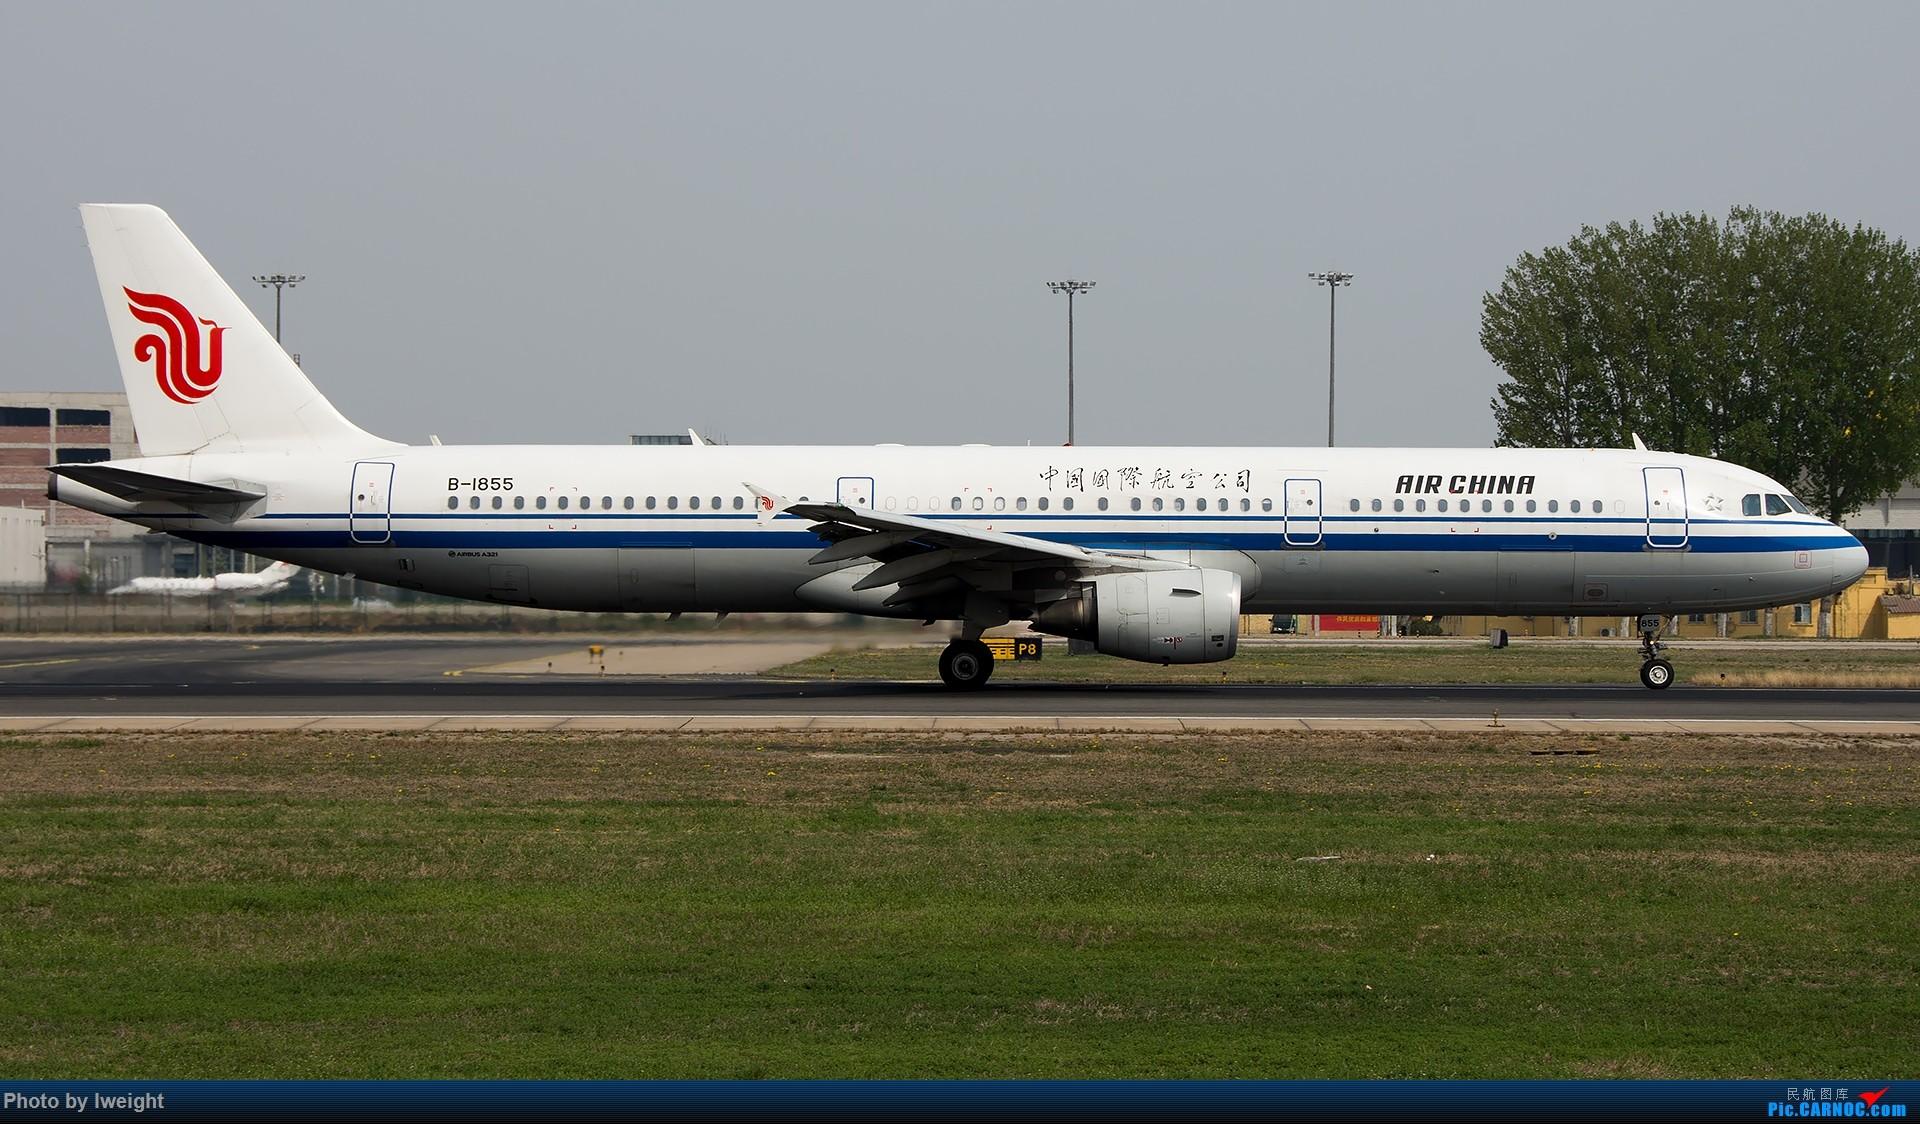 Re:[原创]霾,18R,高密度 AIRBUS A321-200 B-1855 中国北京首都国际机场